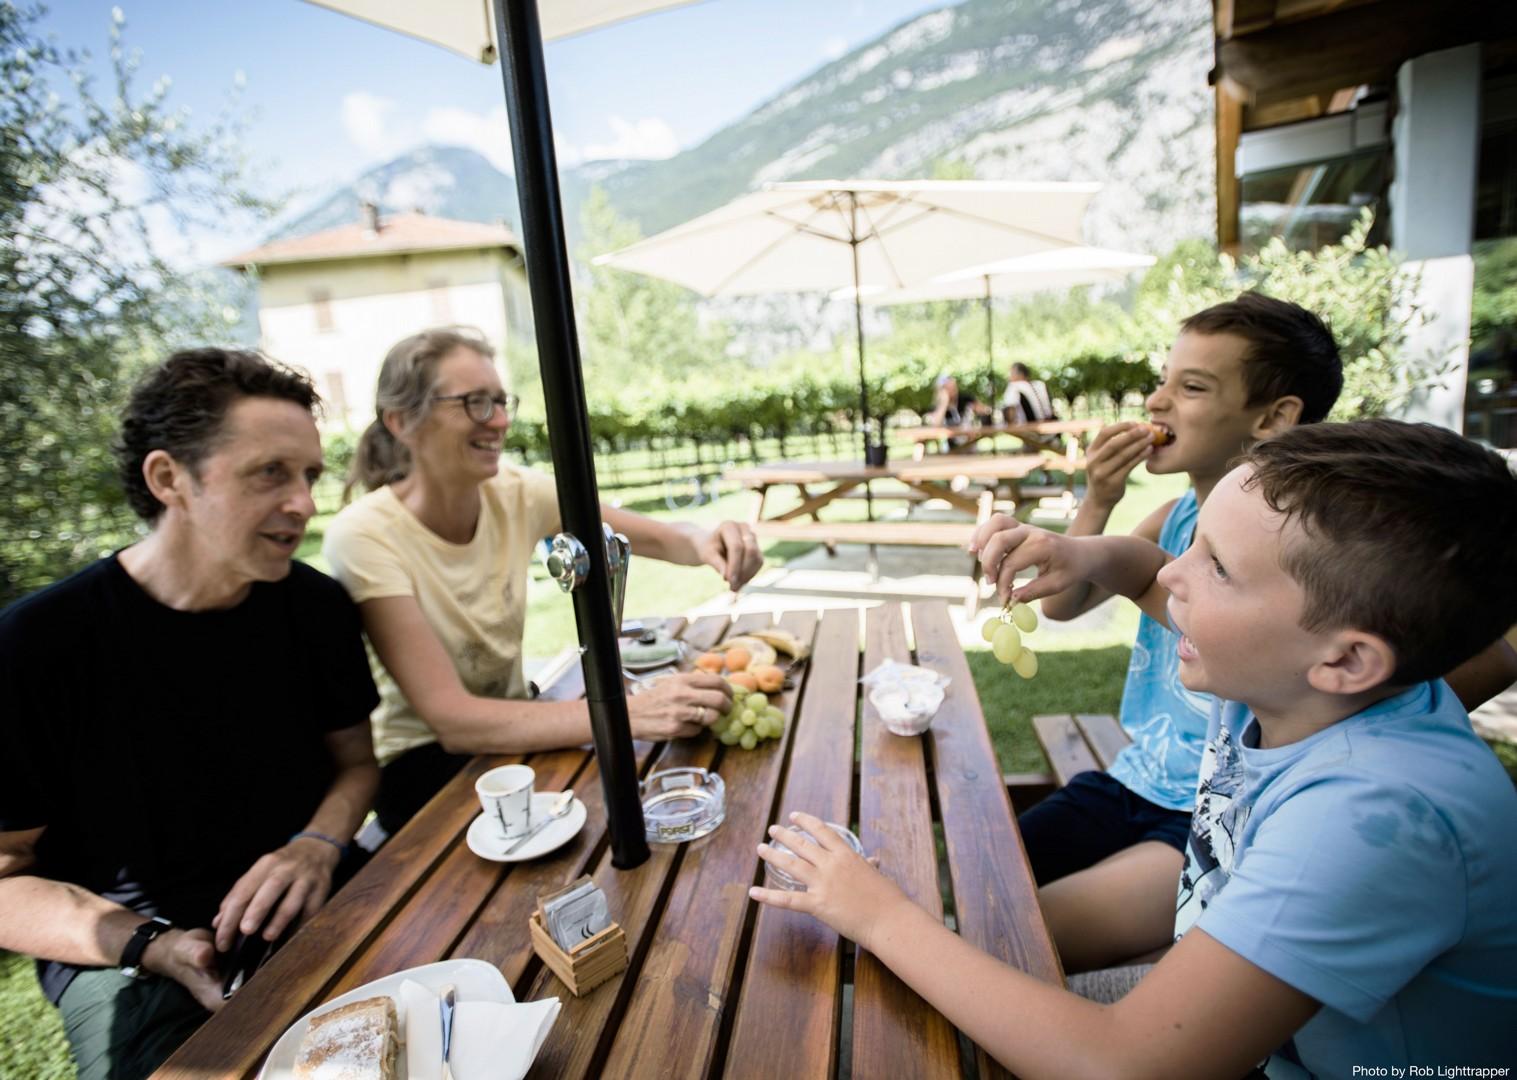 picnic-italy-lake-garda-family.jpg - Italy - Lake Garda Explorer - Self-Guided Family Cycling Holiday - Family Cycling